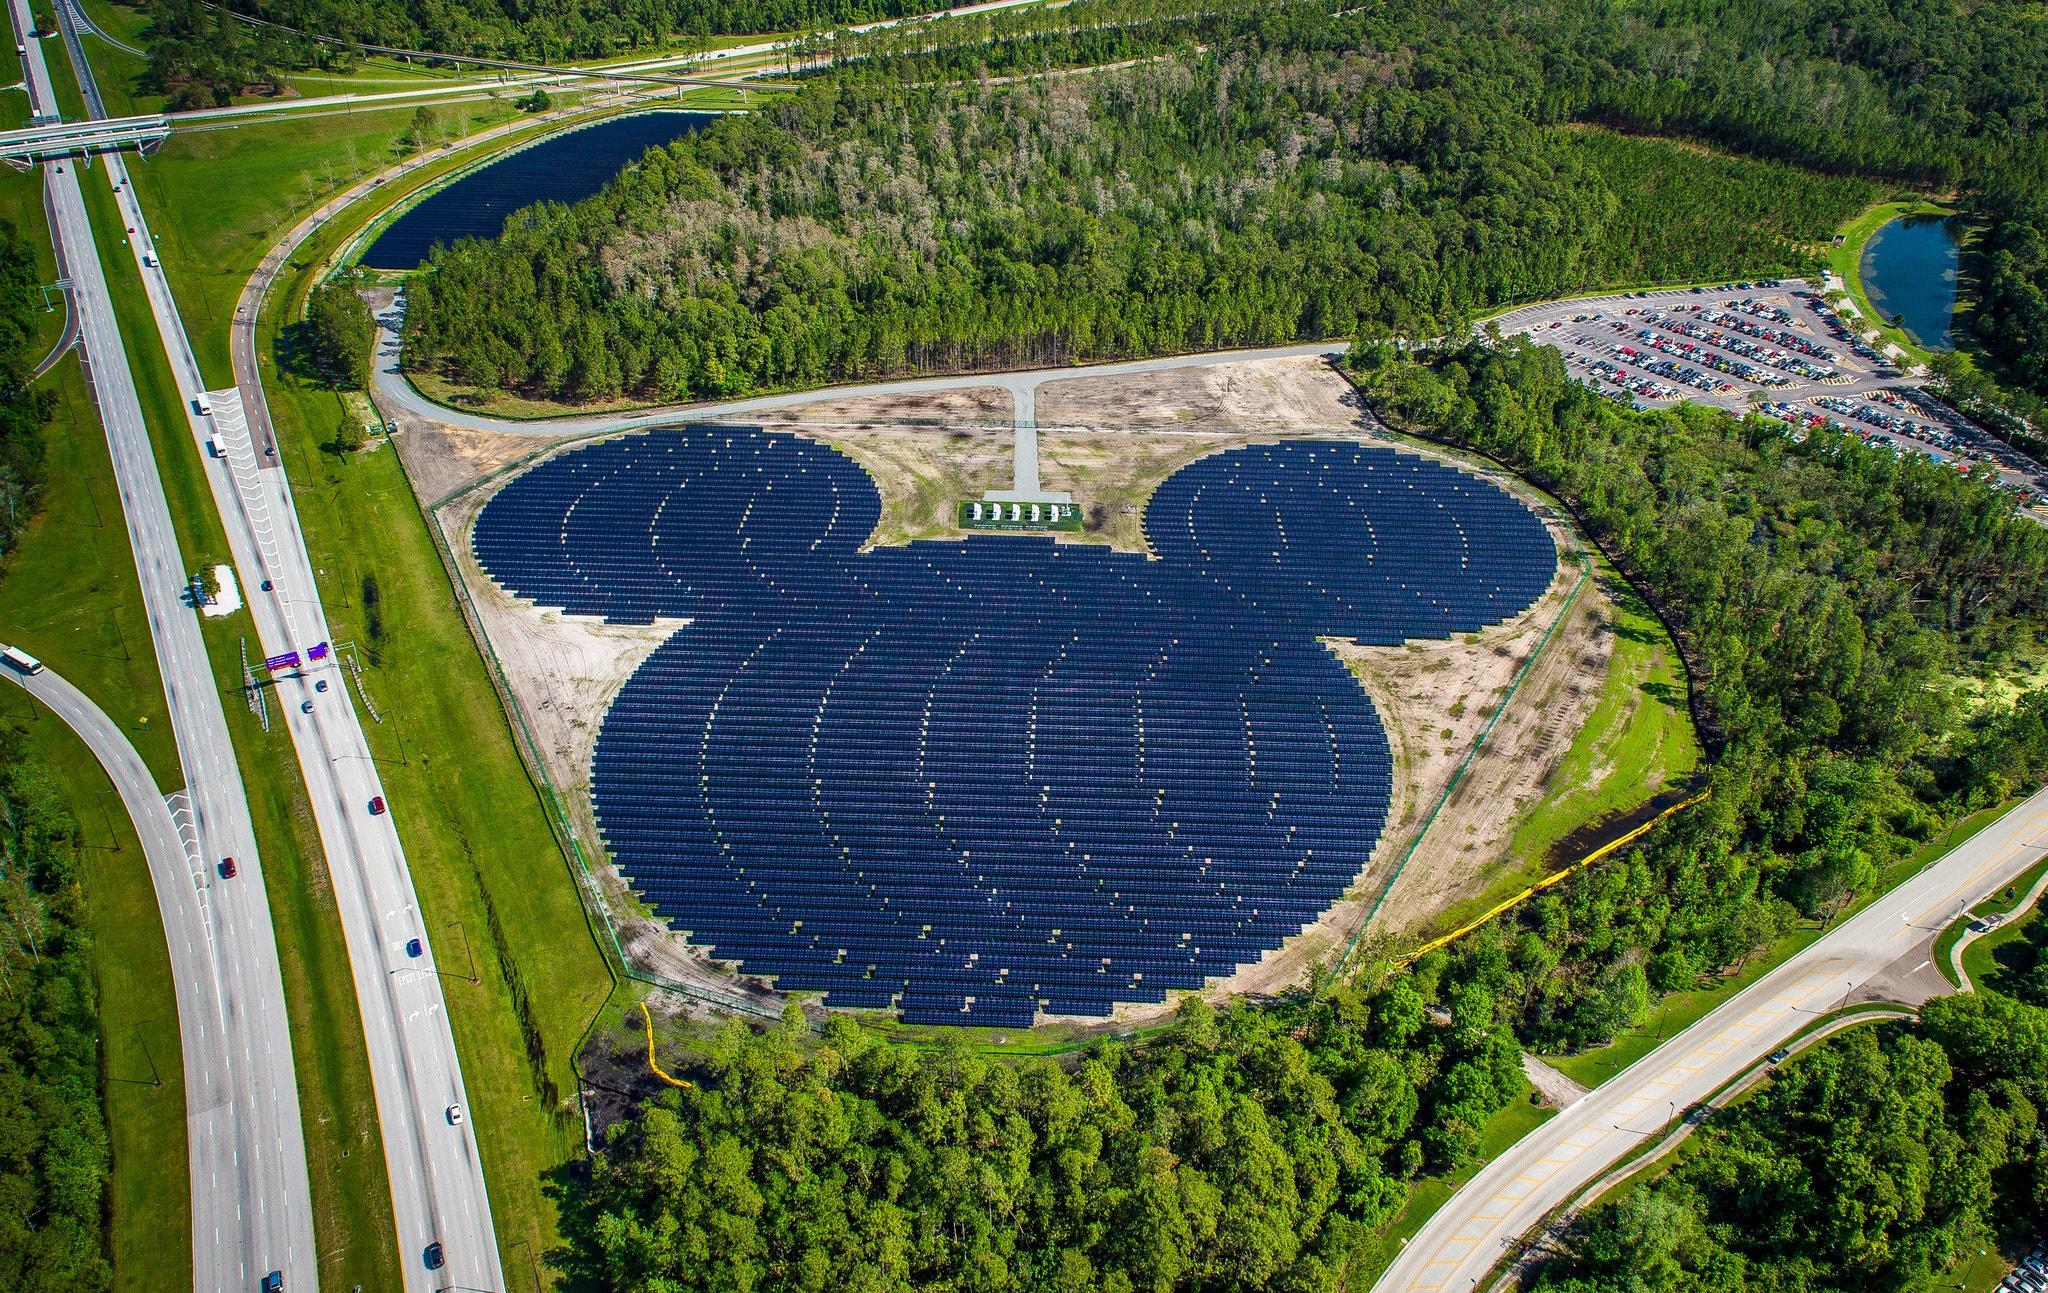 Walt Disney's Sustainability Initiatives: A Case Study